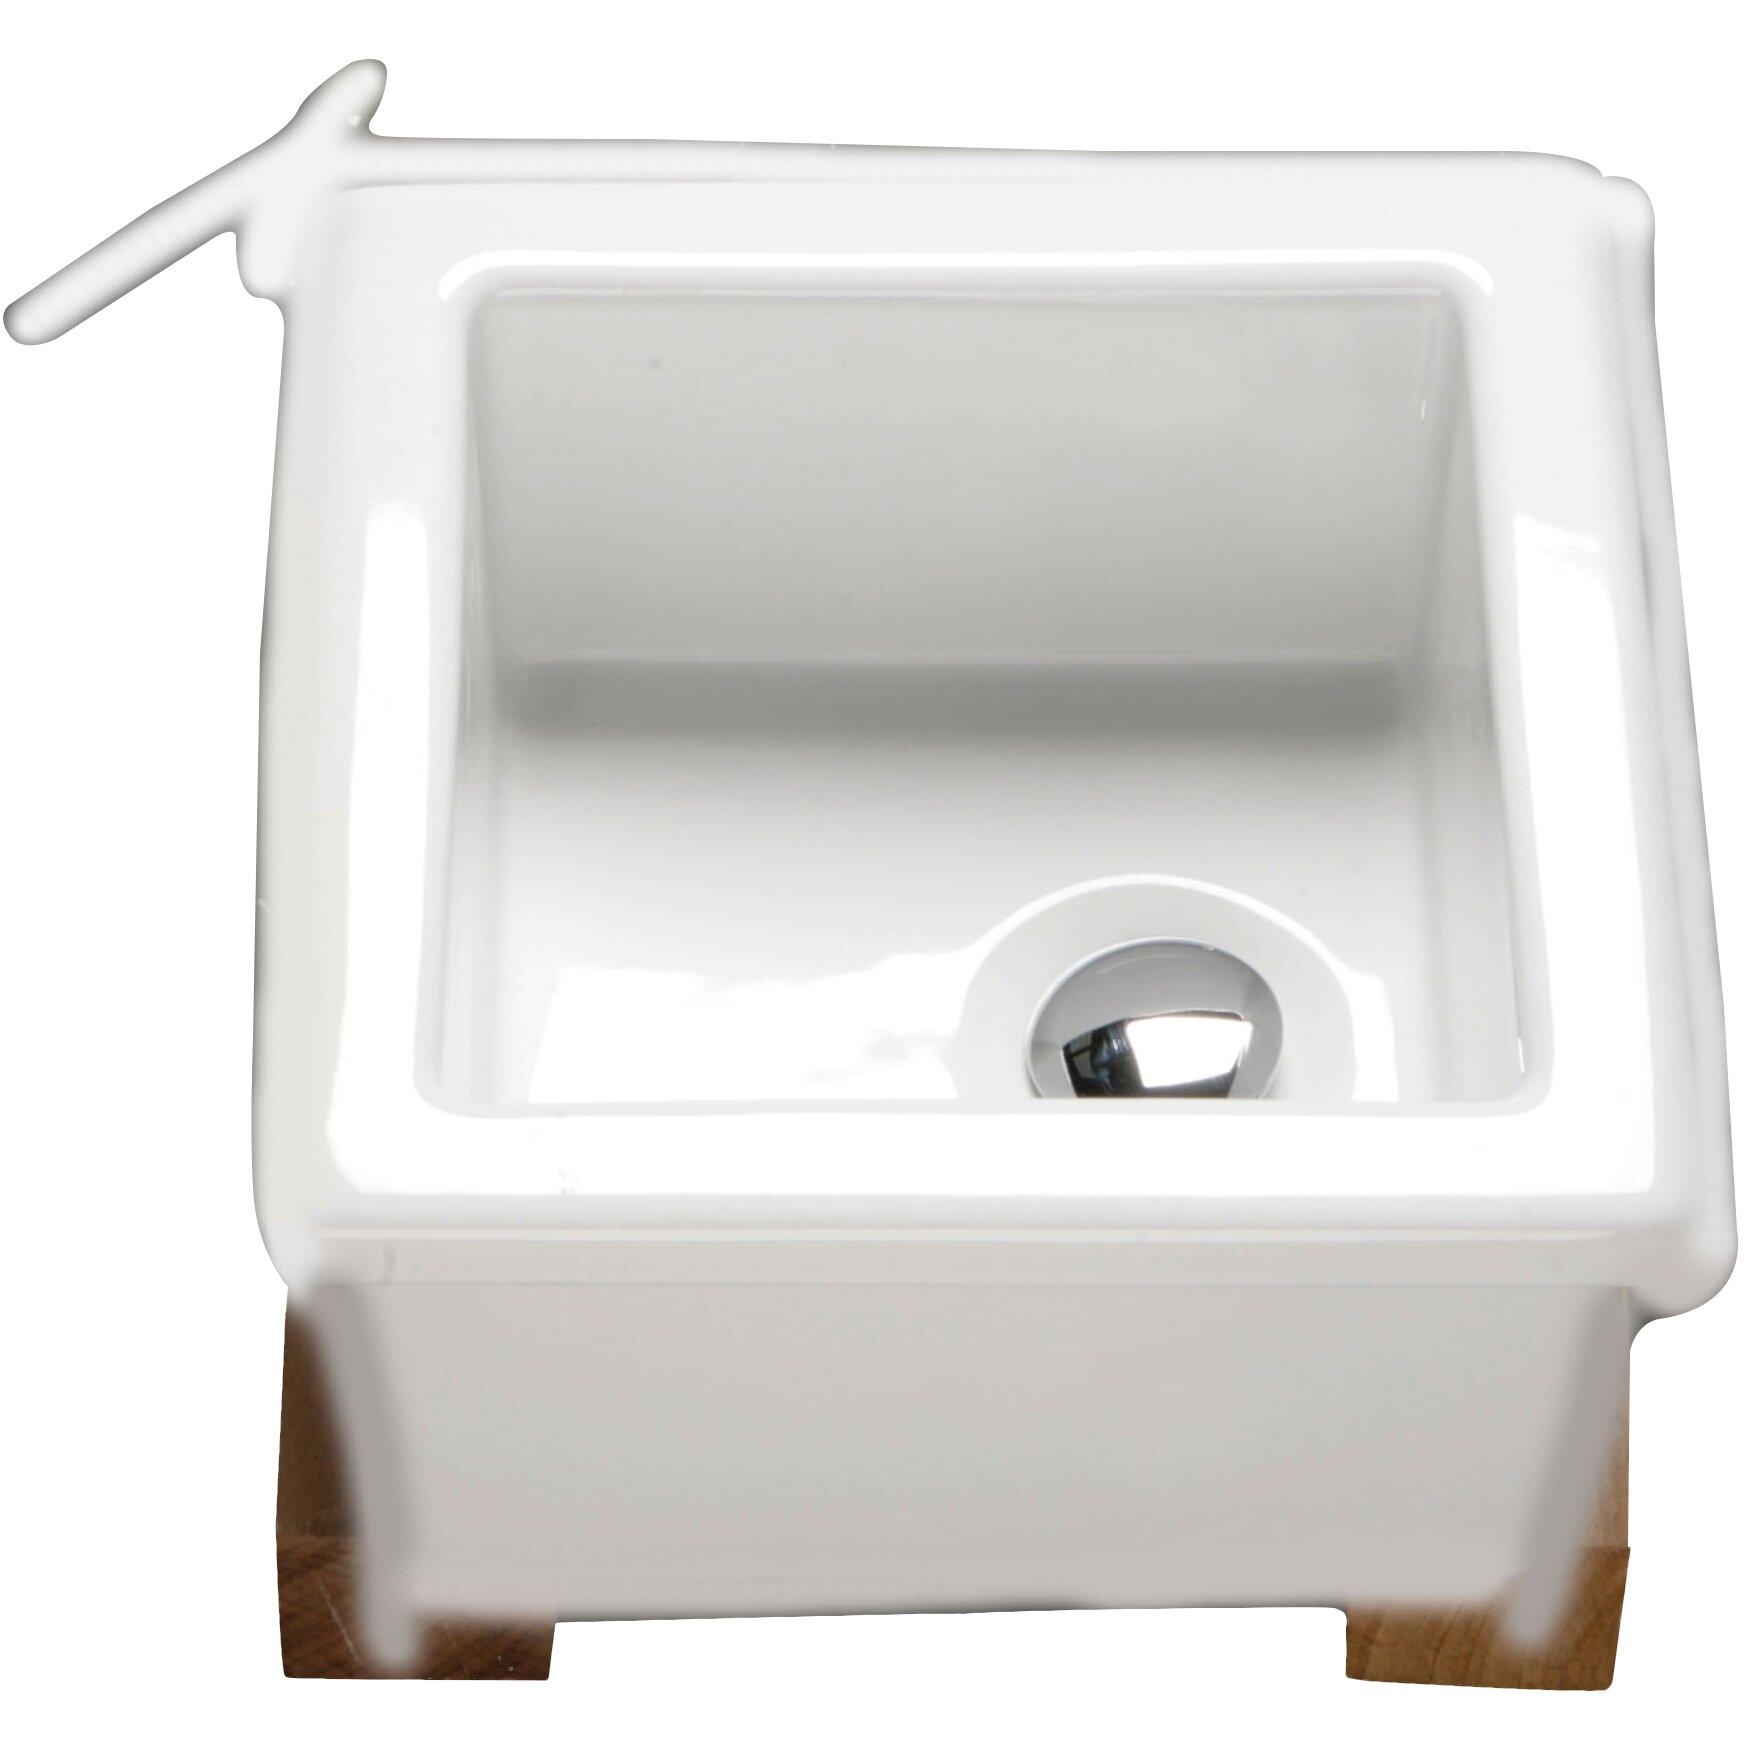 RAK Ceramics Kitchen Sinks 33cm Recessed Basin Wayfair UK